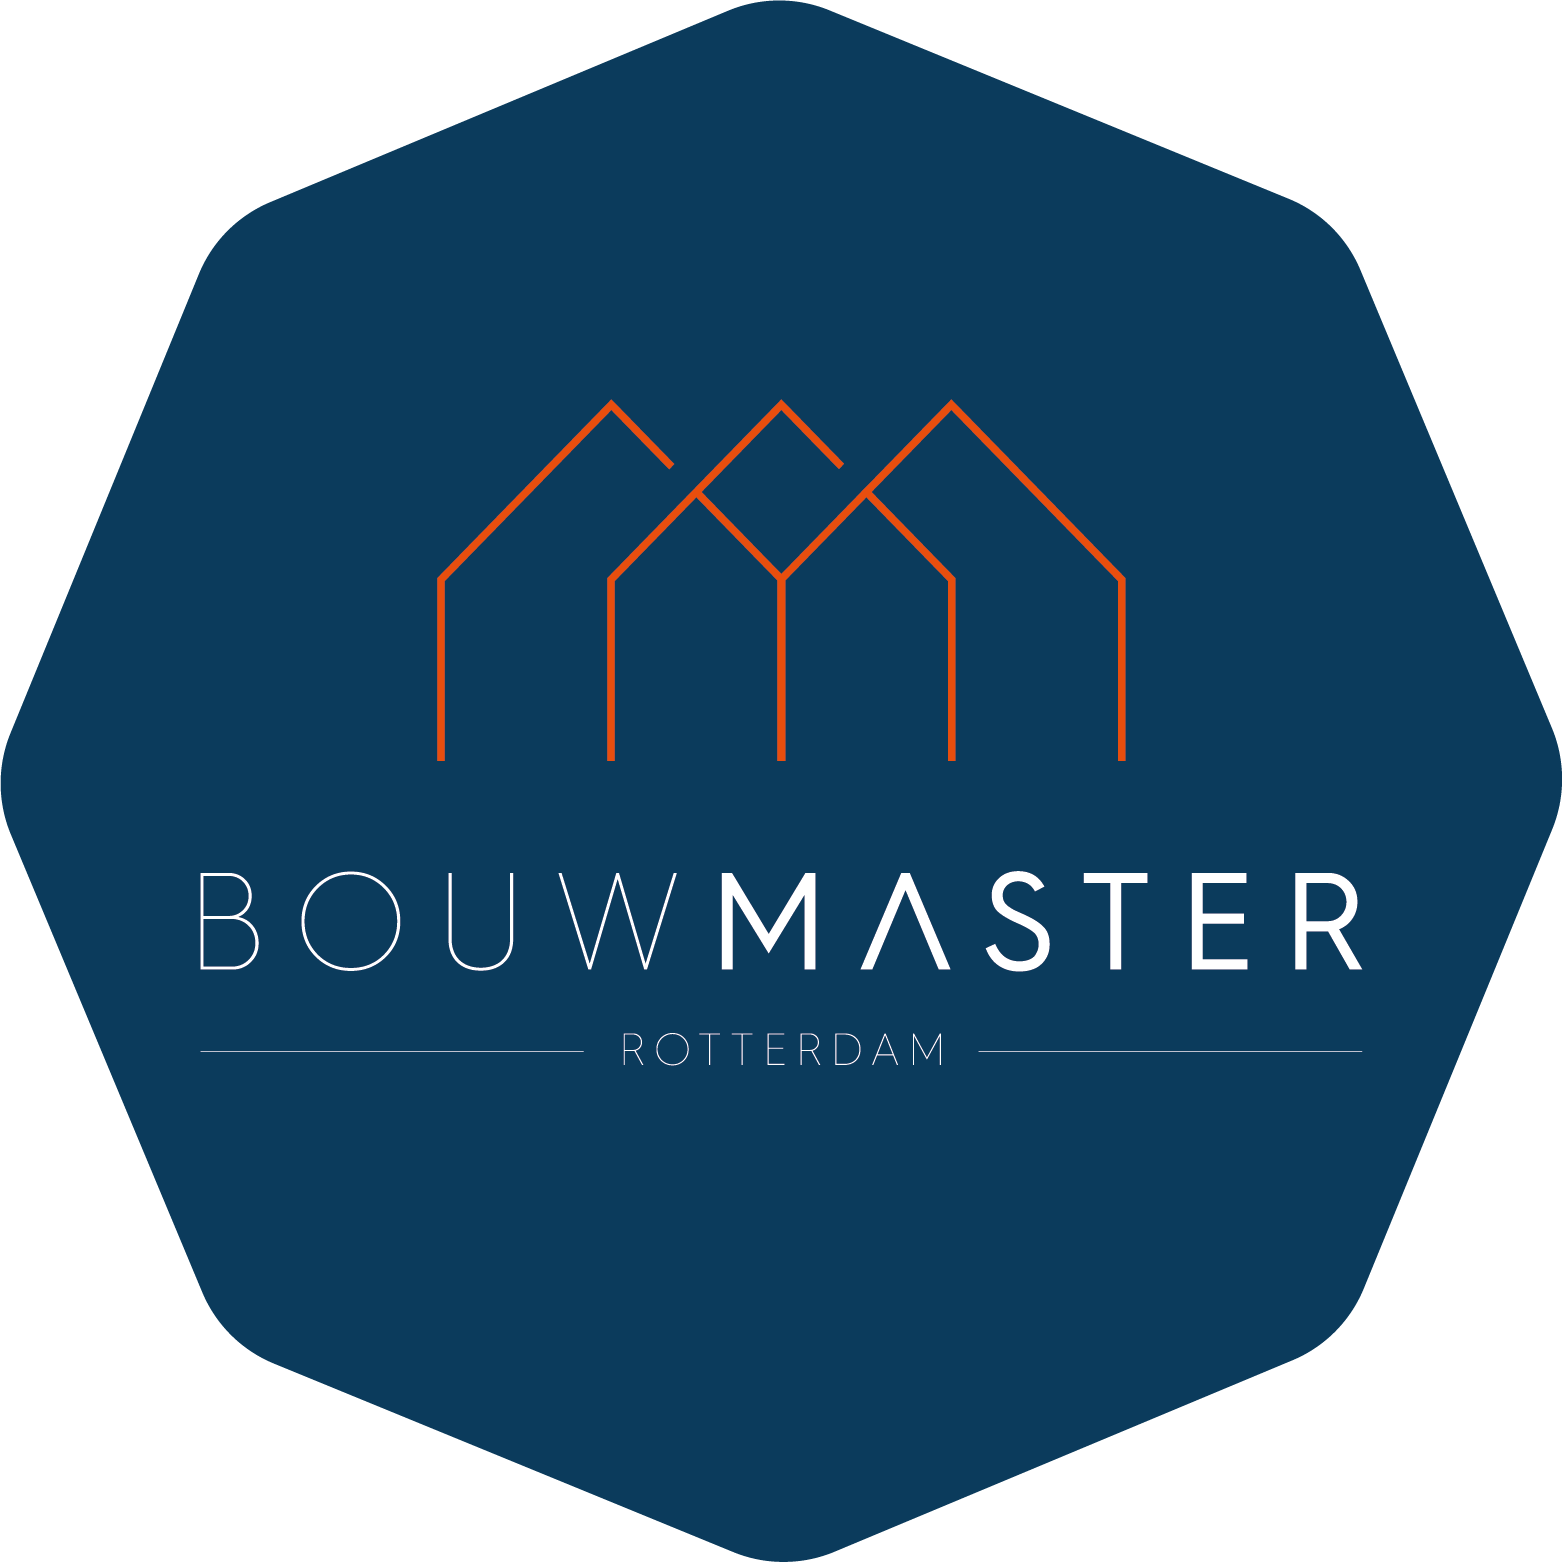 Bouwmaster Rotterdam BV